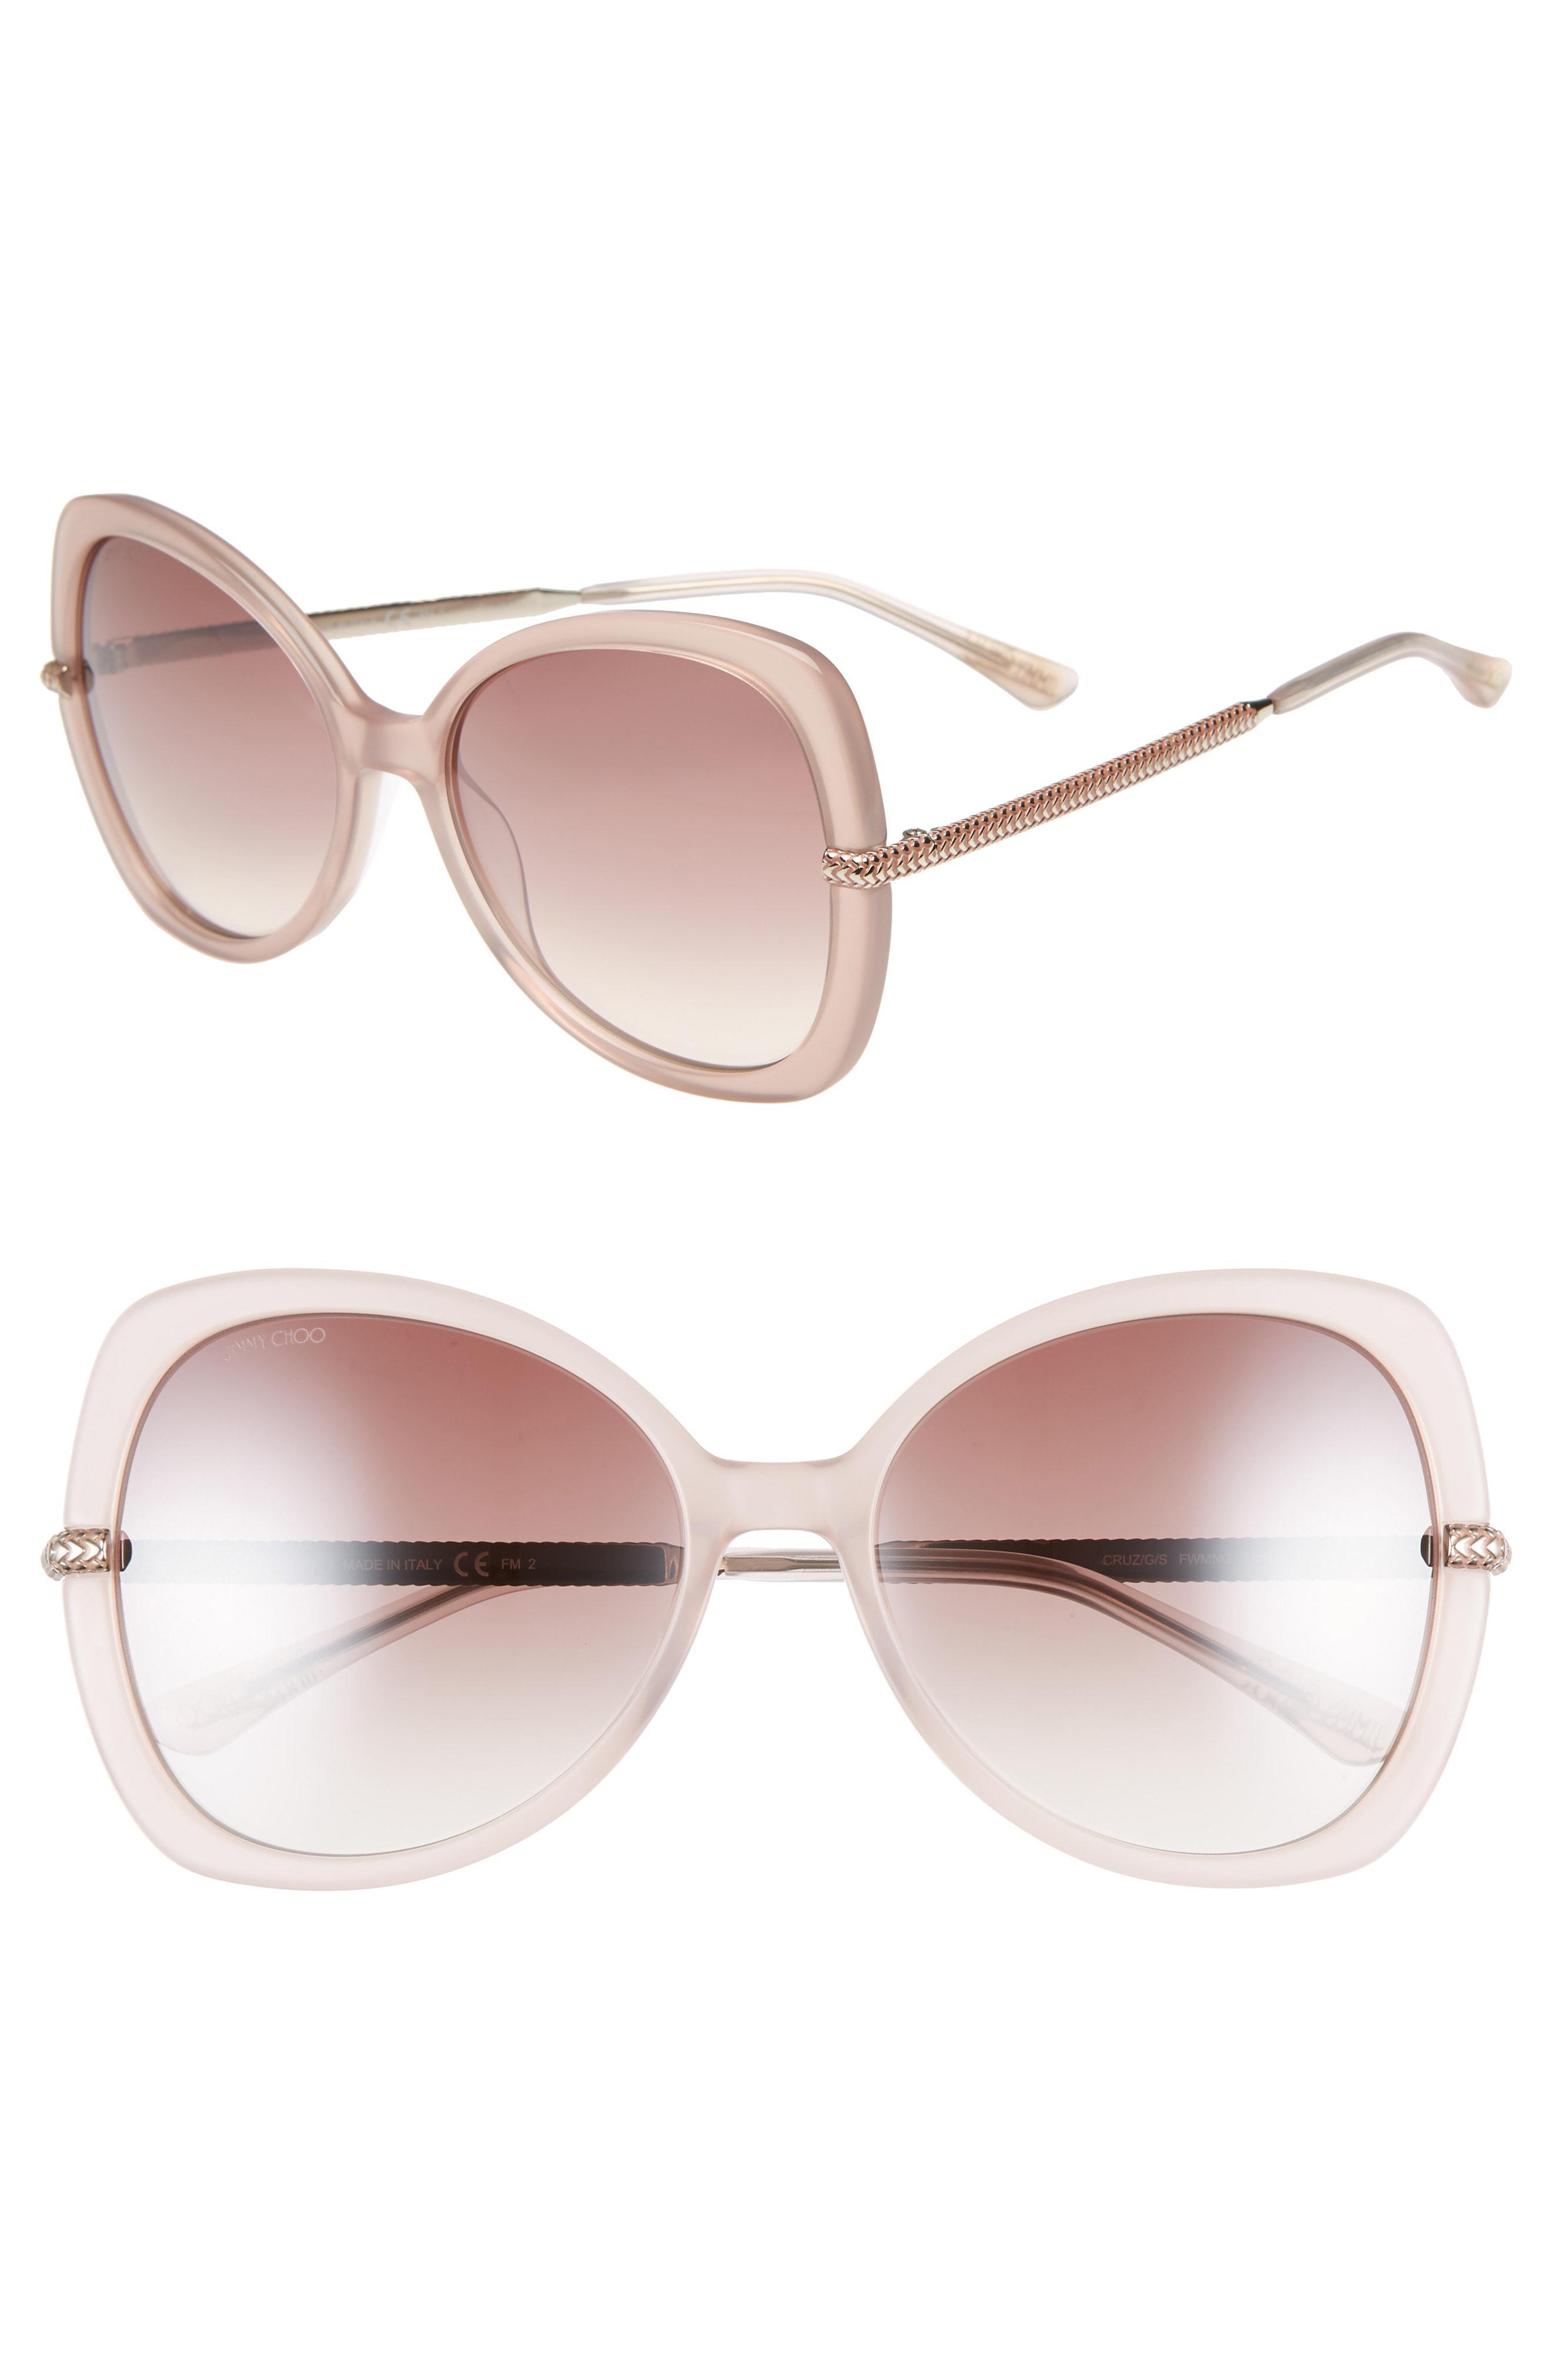 4e27ae9aa110 Jimmy Choo Cruz 58mm Butterfly Sunglasses - Nude - Lyst